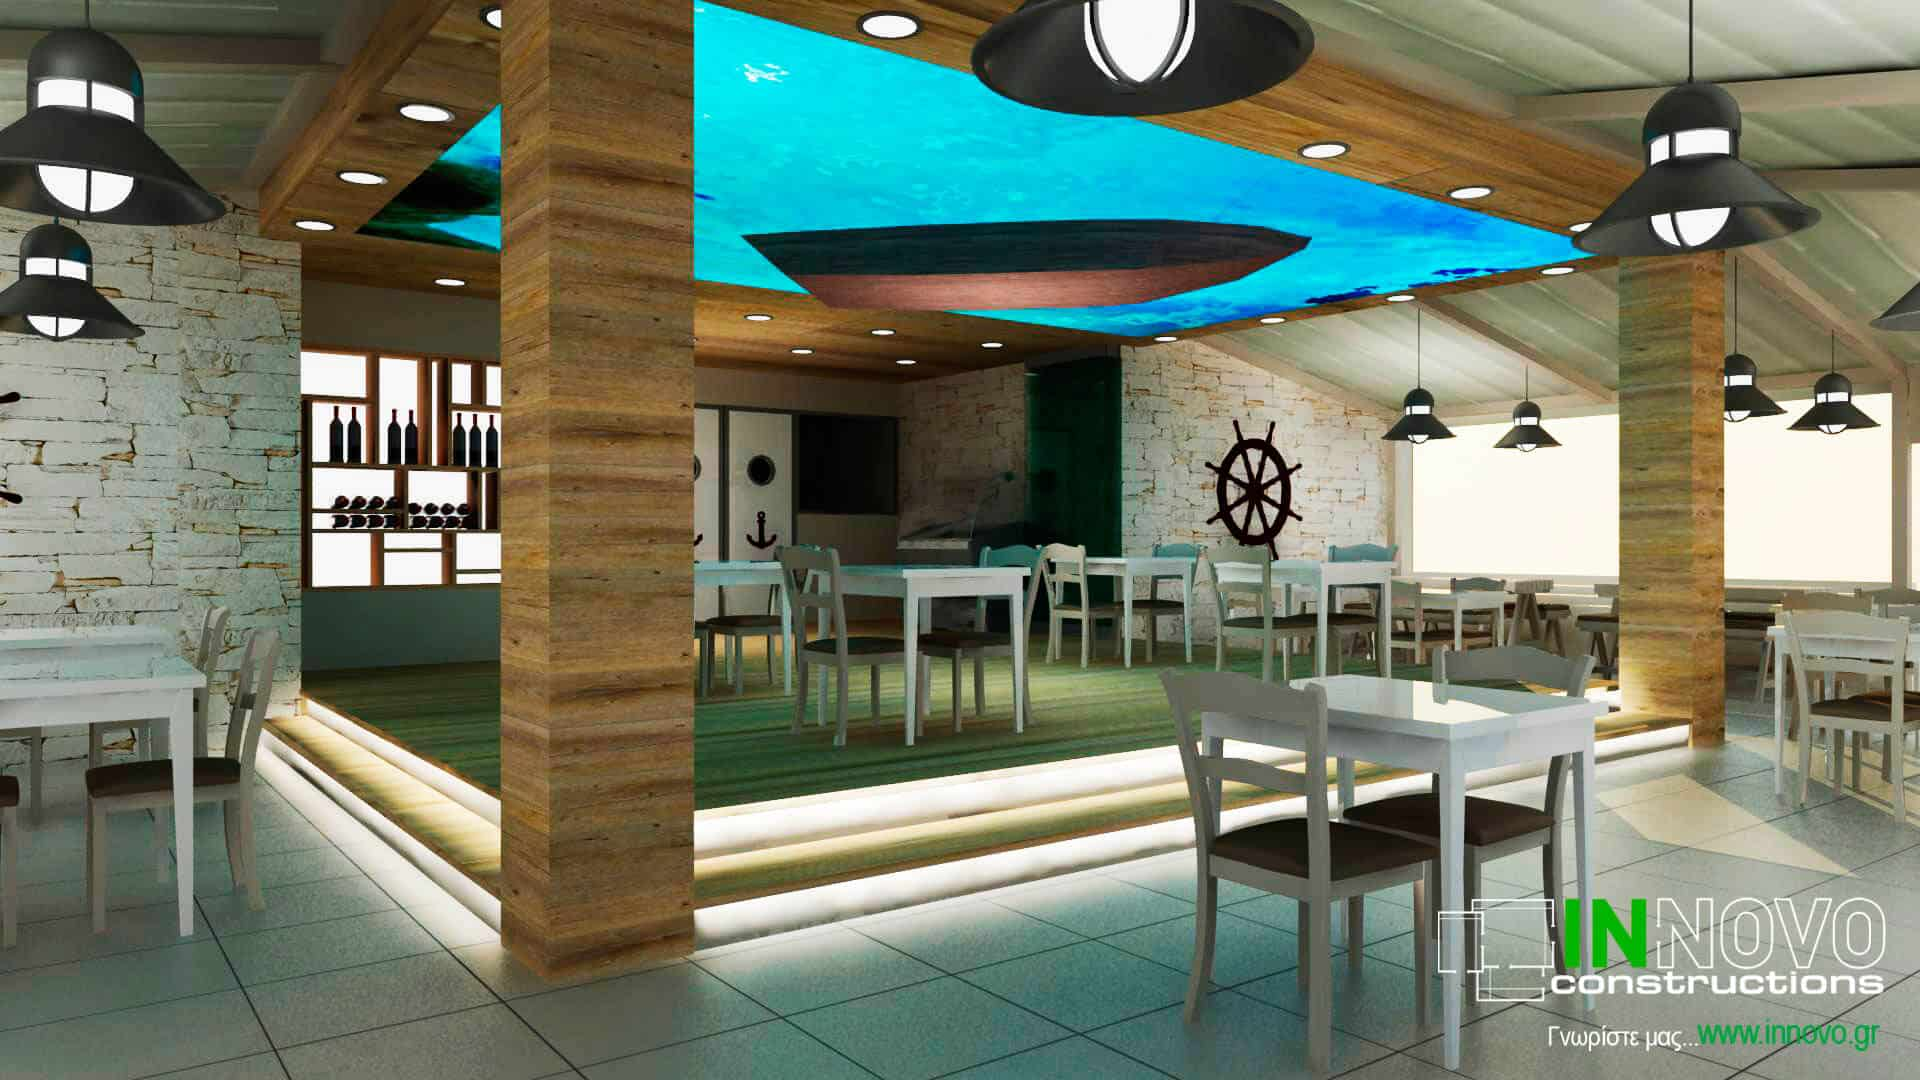 anakainisi-psitopoleiou-restaurant-renovation-psarotaverna-perissos-1414-9-1